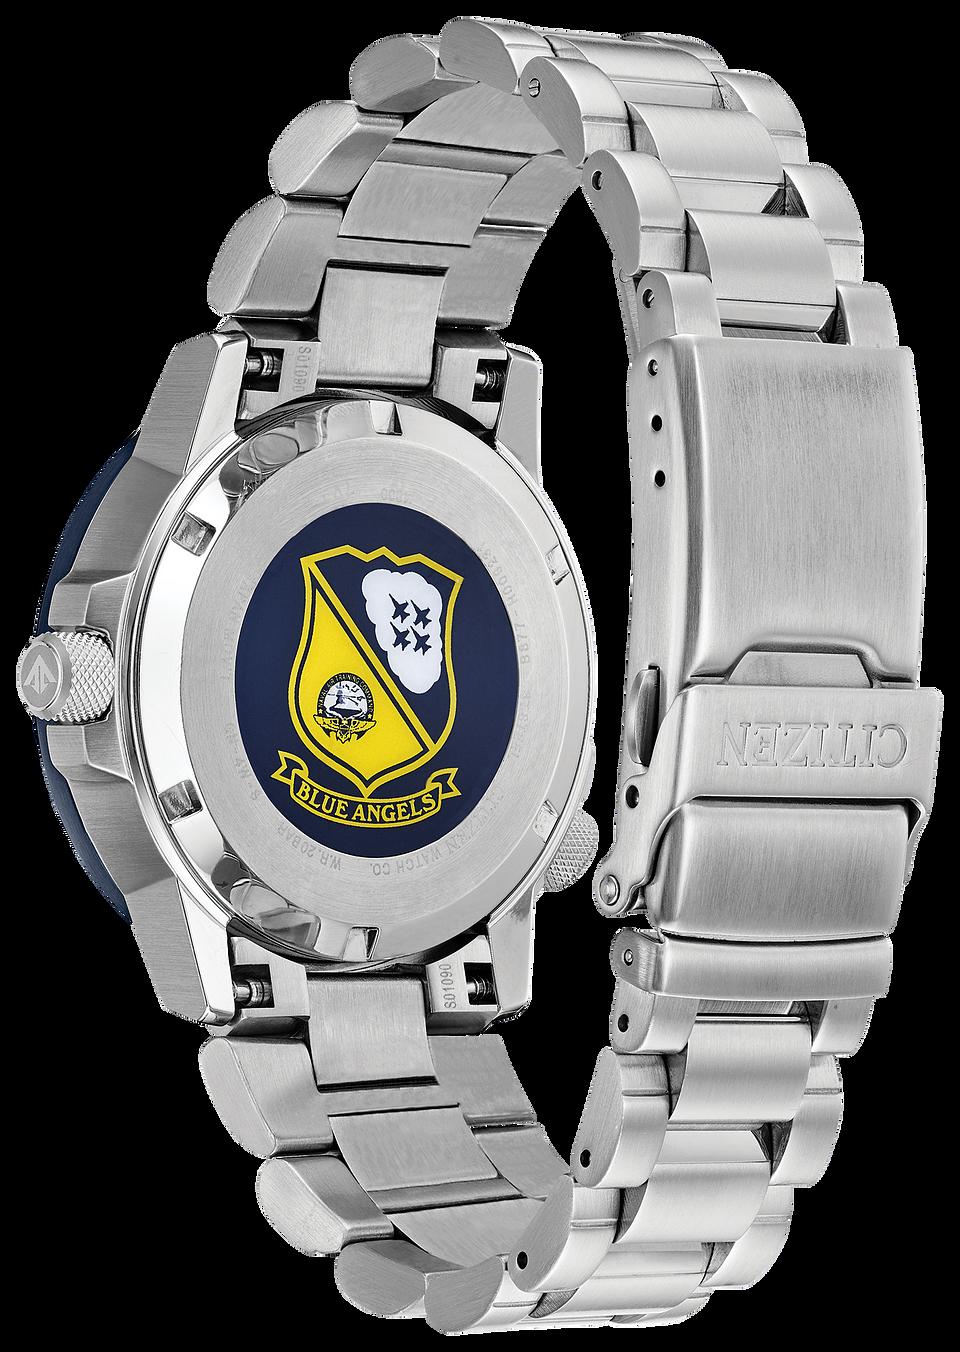 23095a5b465 Promaster Nighthawk - Men s BJ7006-56L Large Face Flight Watch